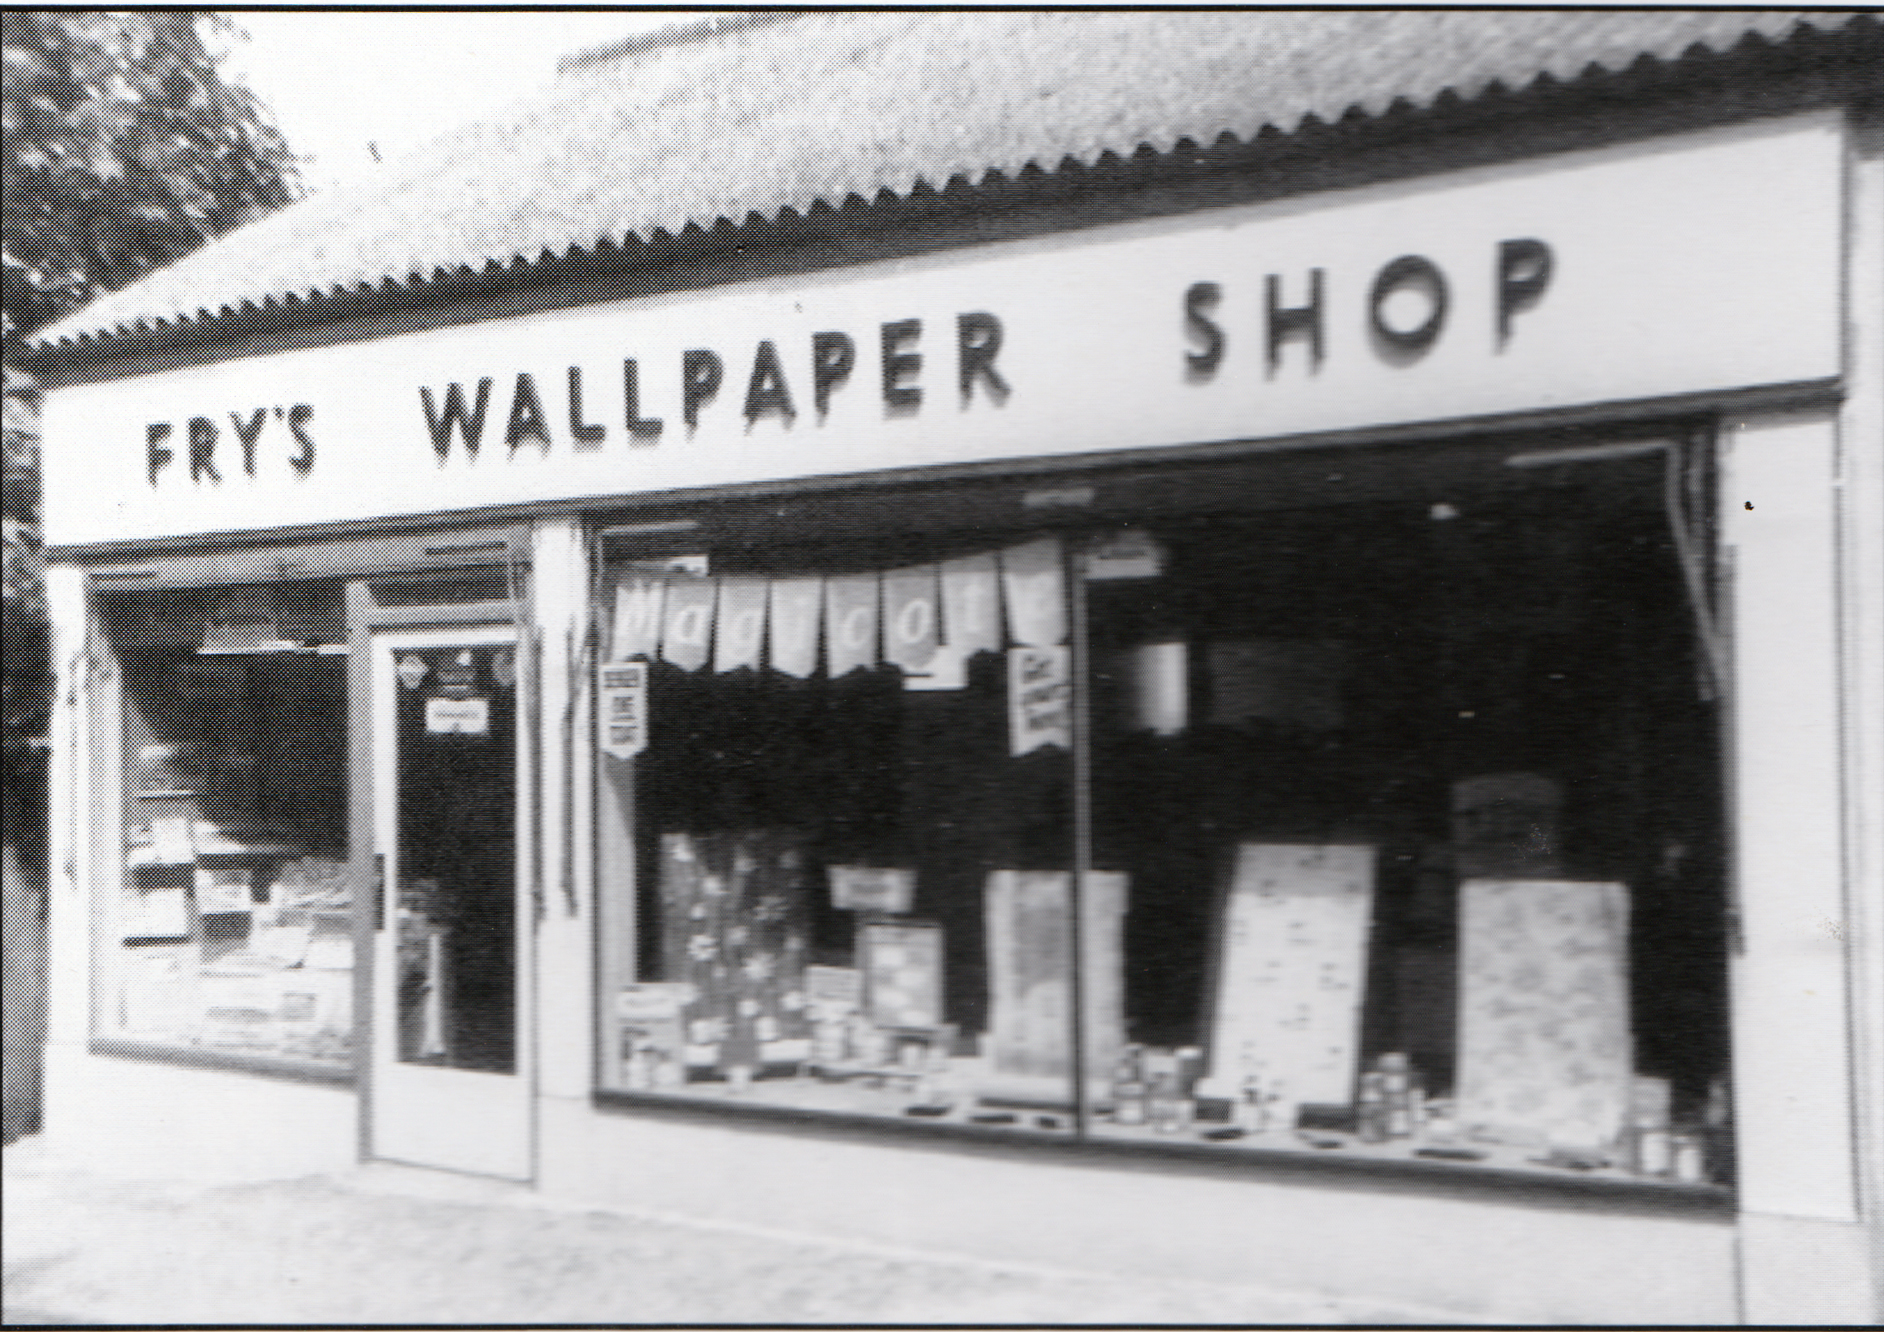 Fry's Wallpaper Shop, Race Hill, Launceston